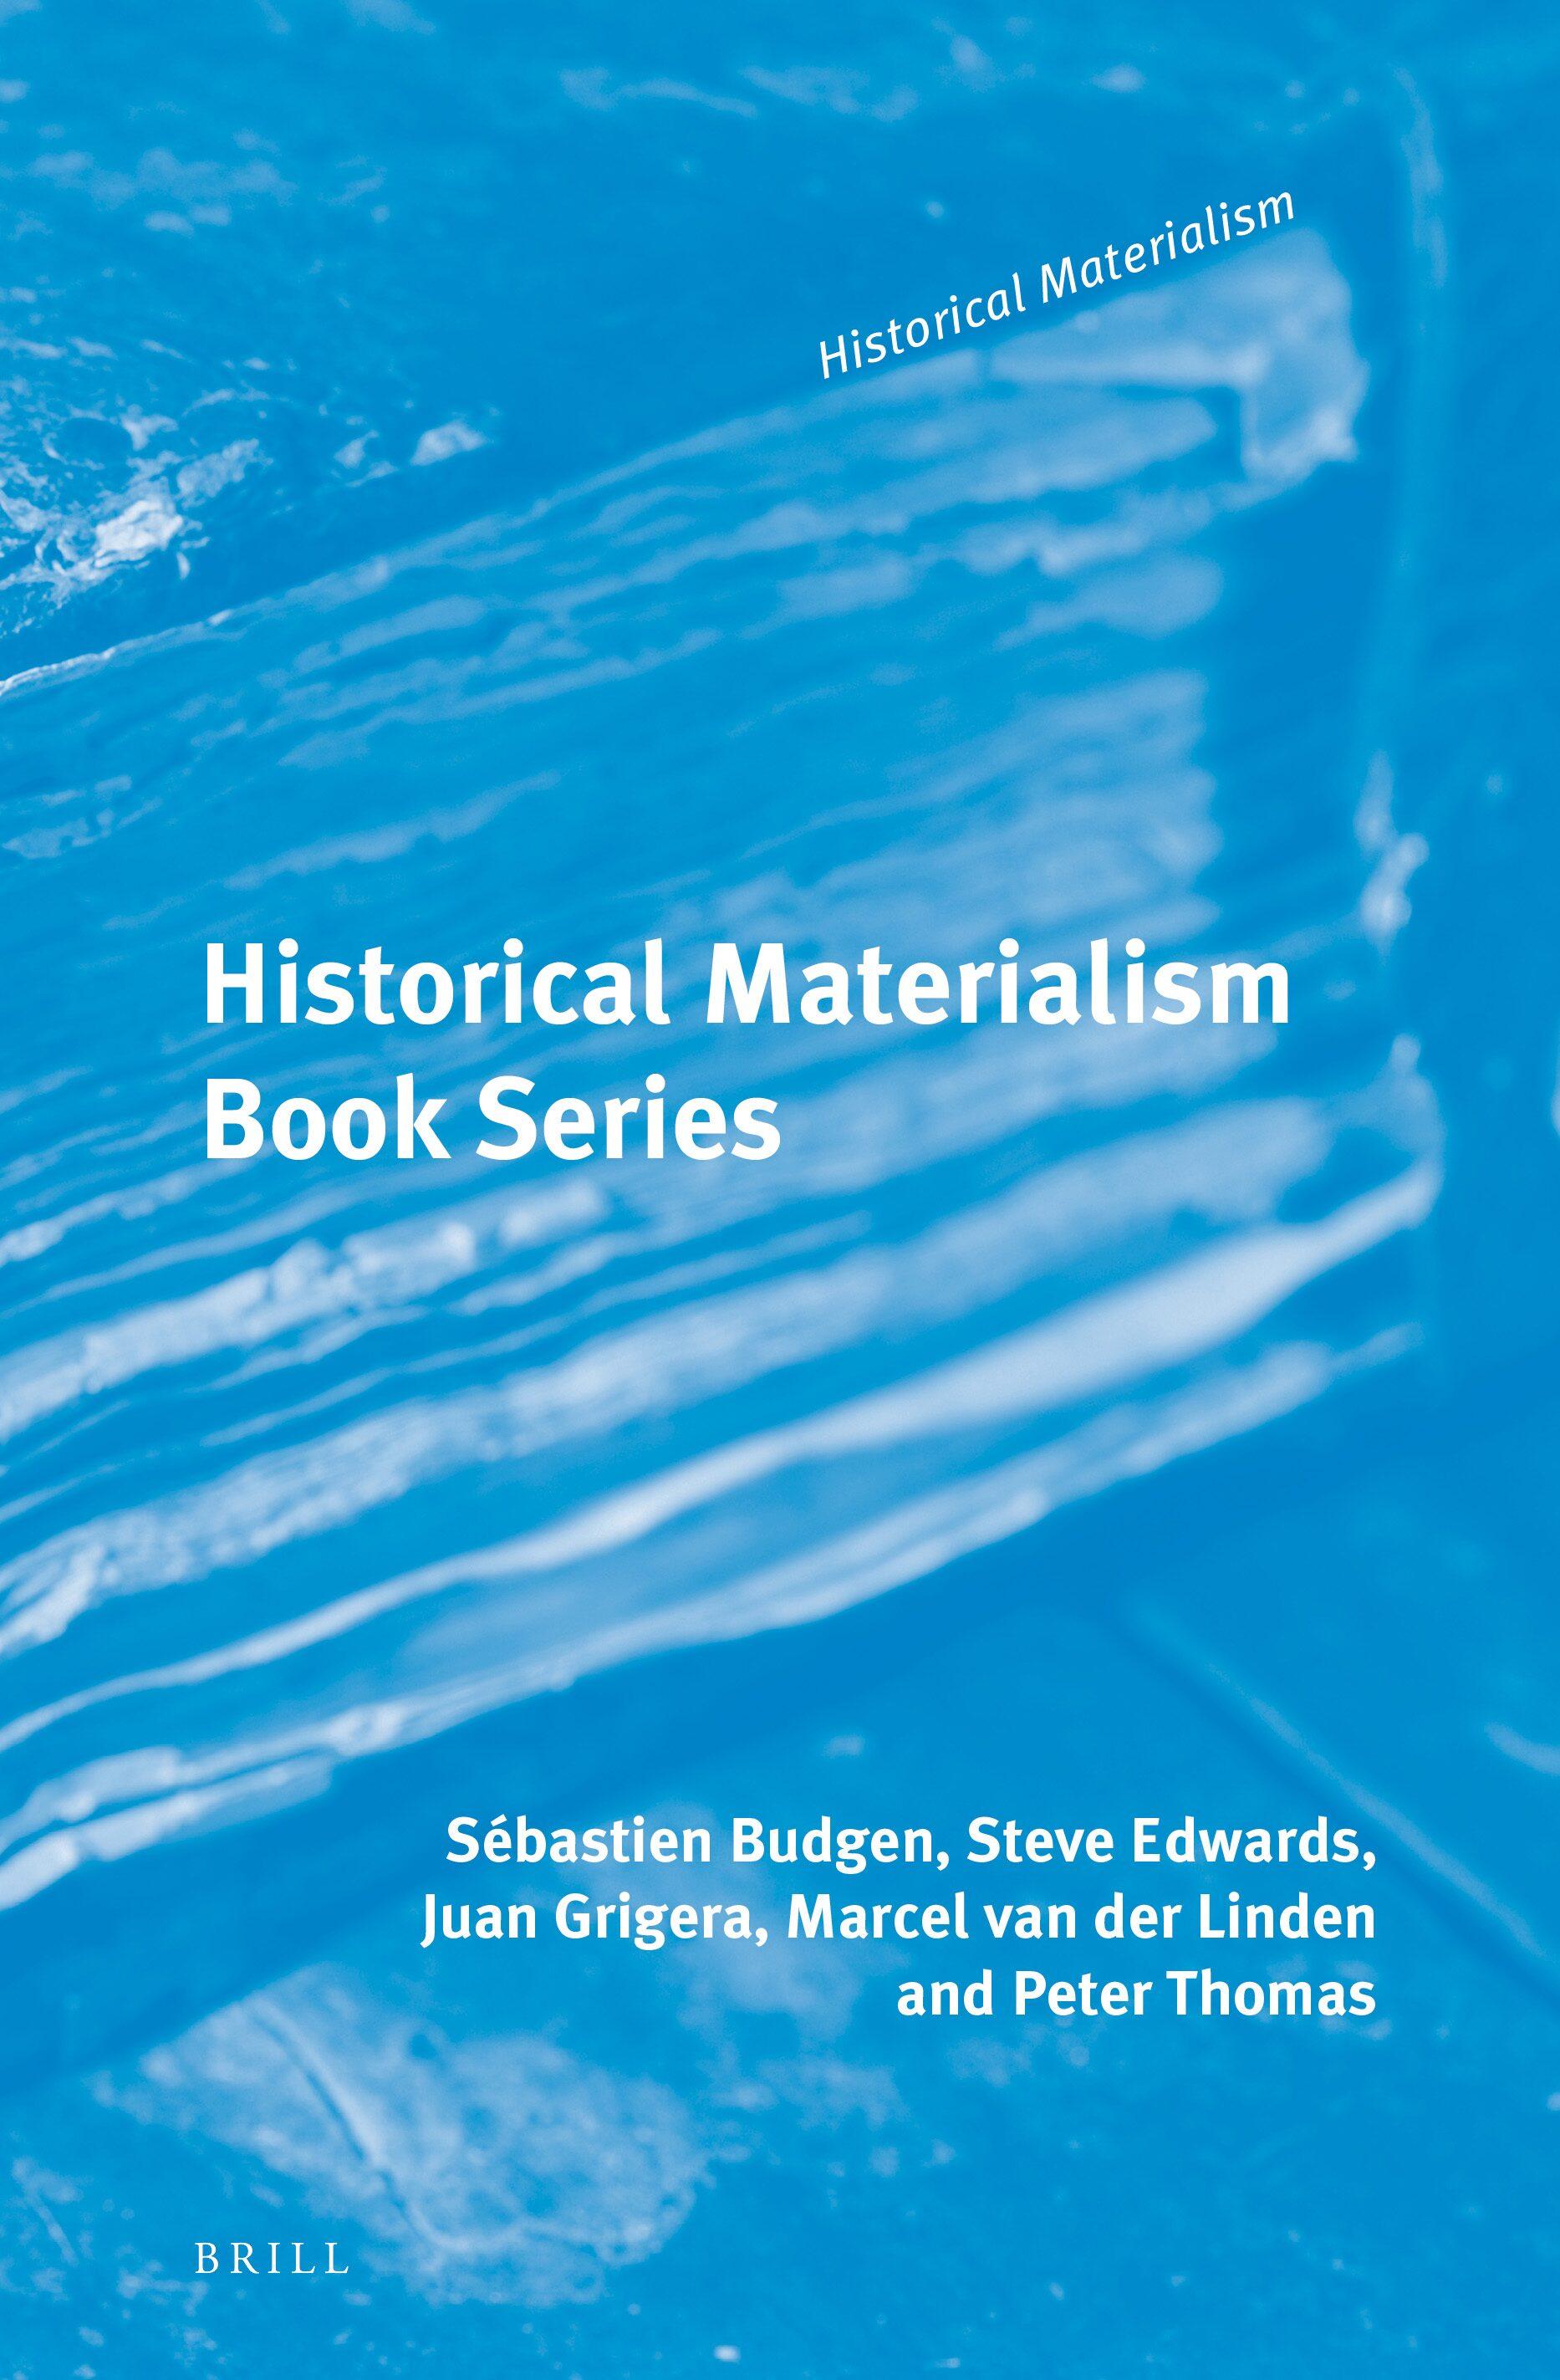 The Revolutionary Marxism of Antonio Gramsci (Historical Materialism Book Series, Volume 62)